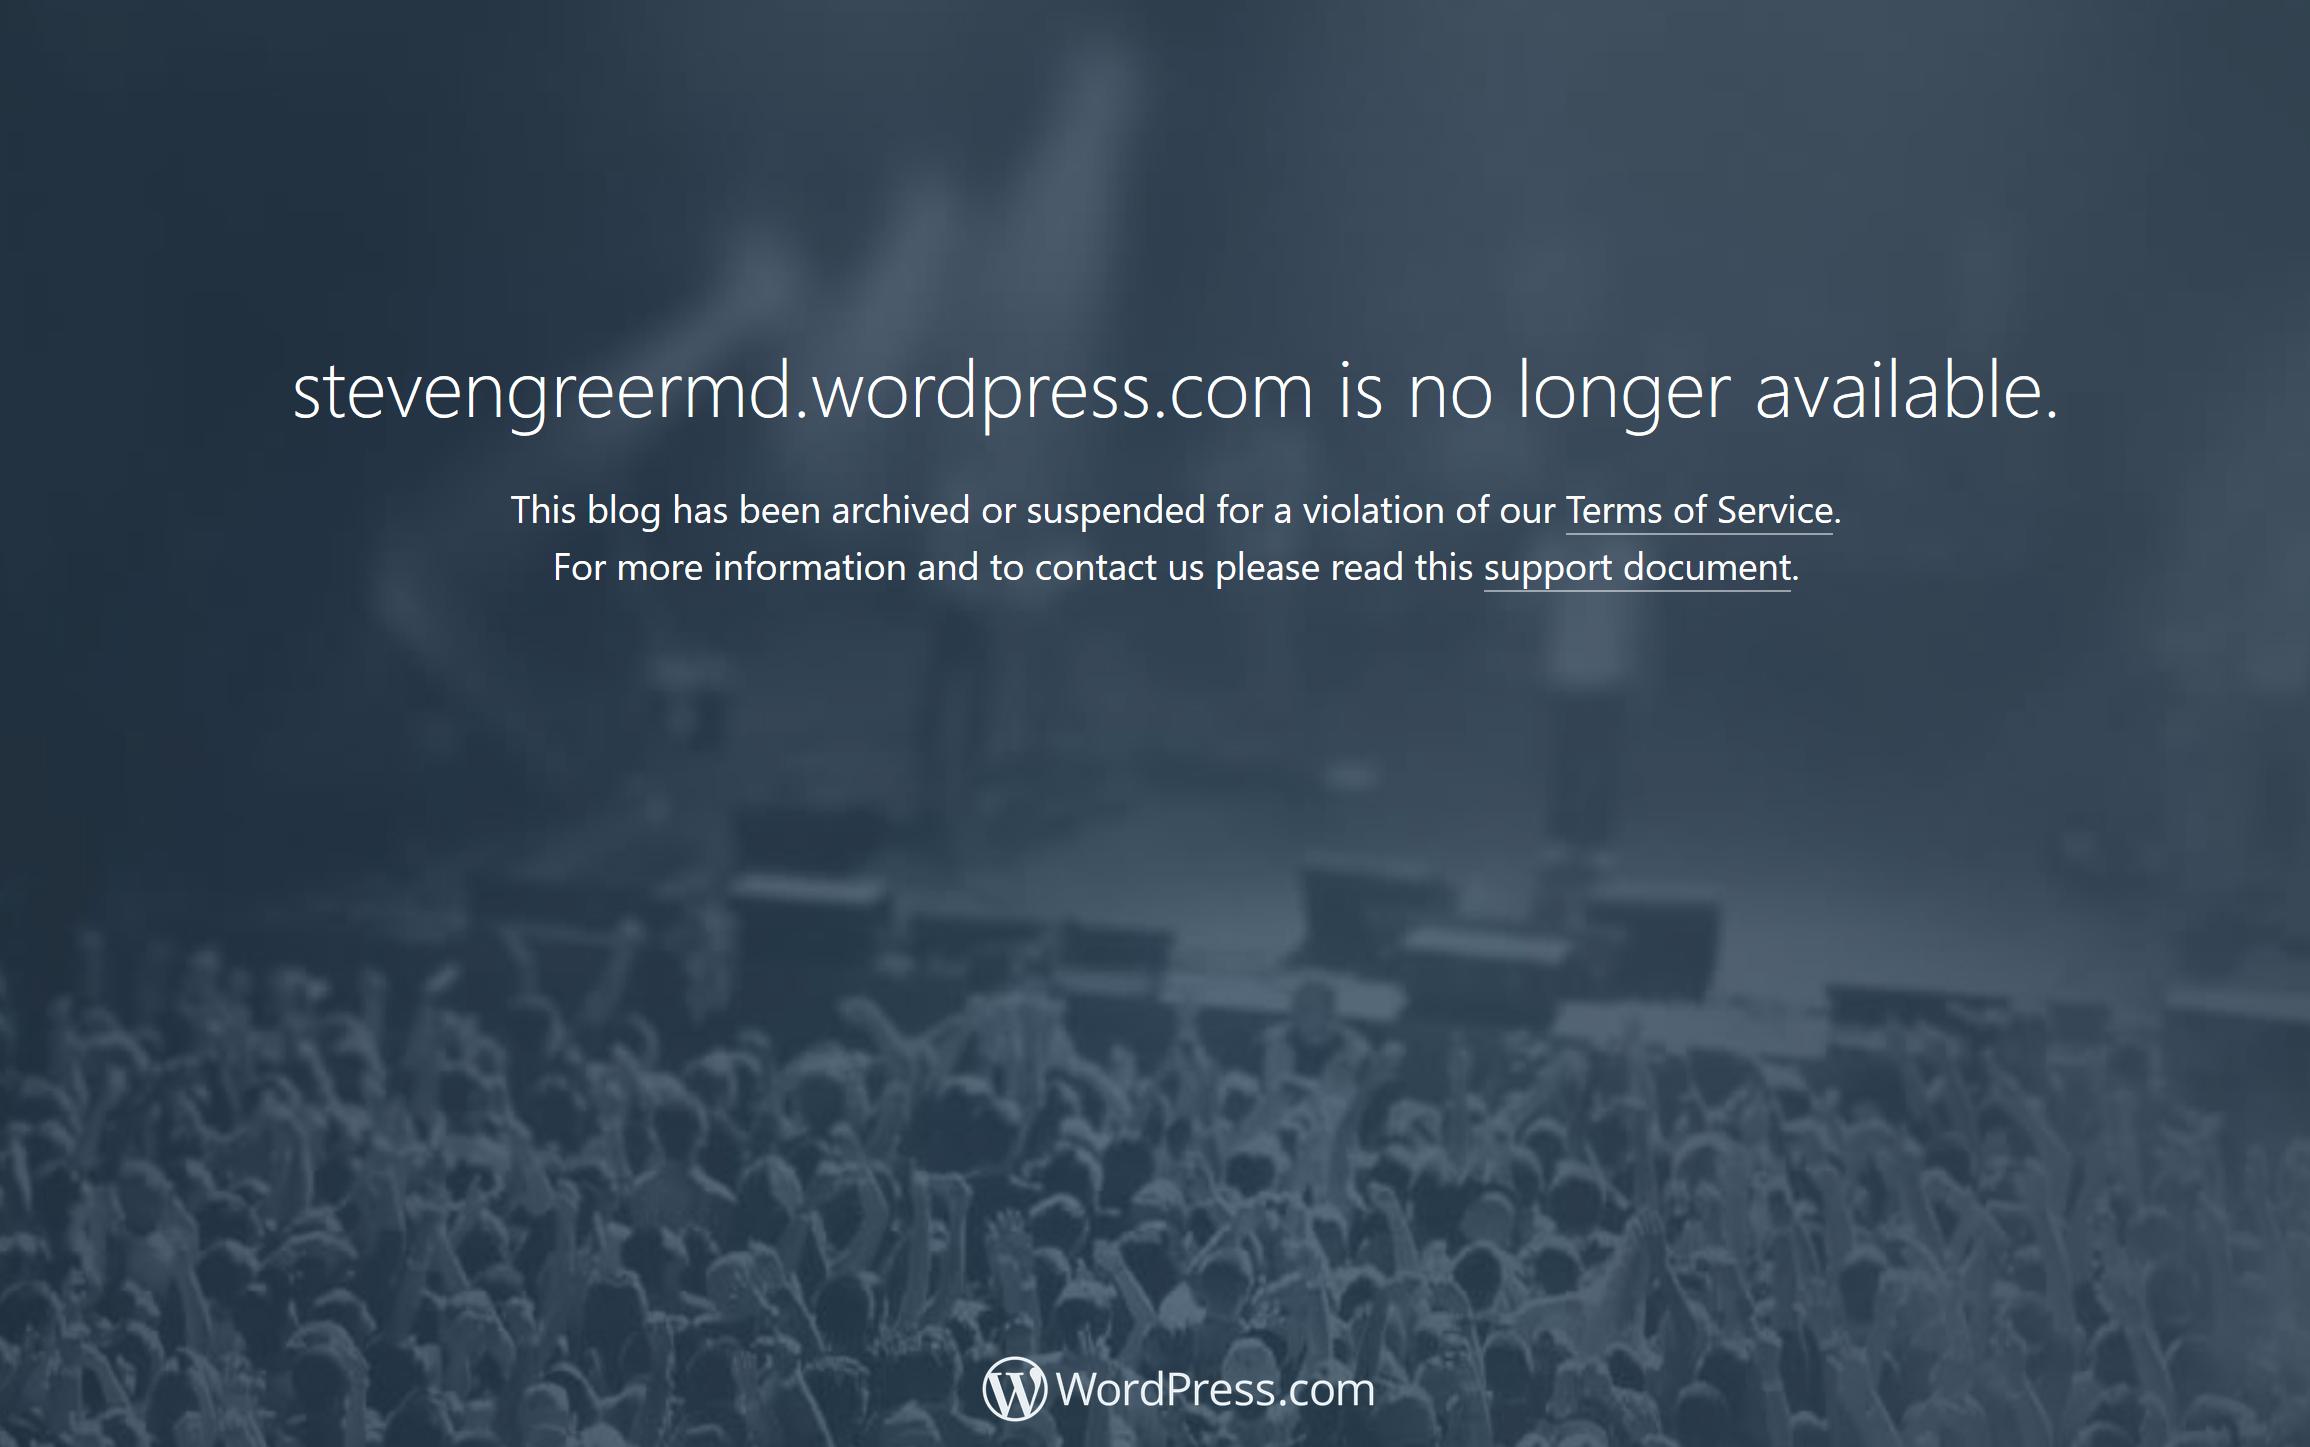 Wordpress Steven Greer site taken down notice